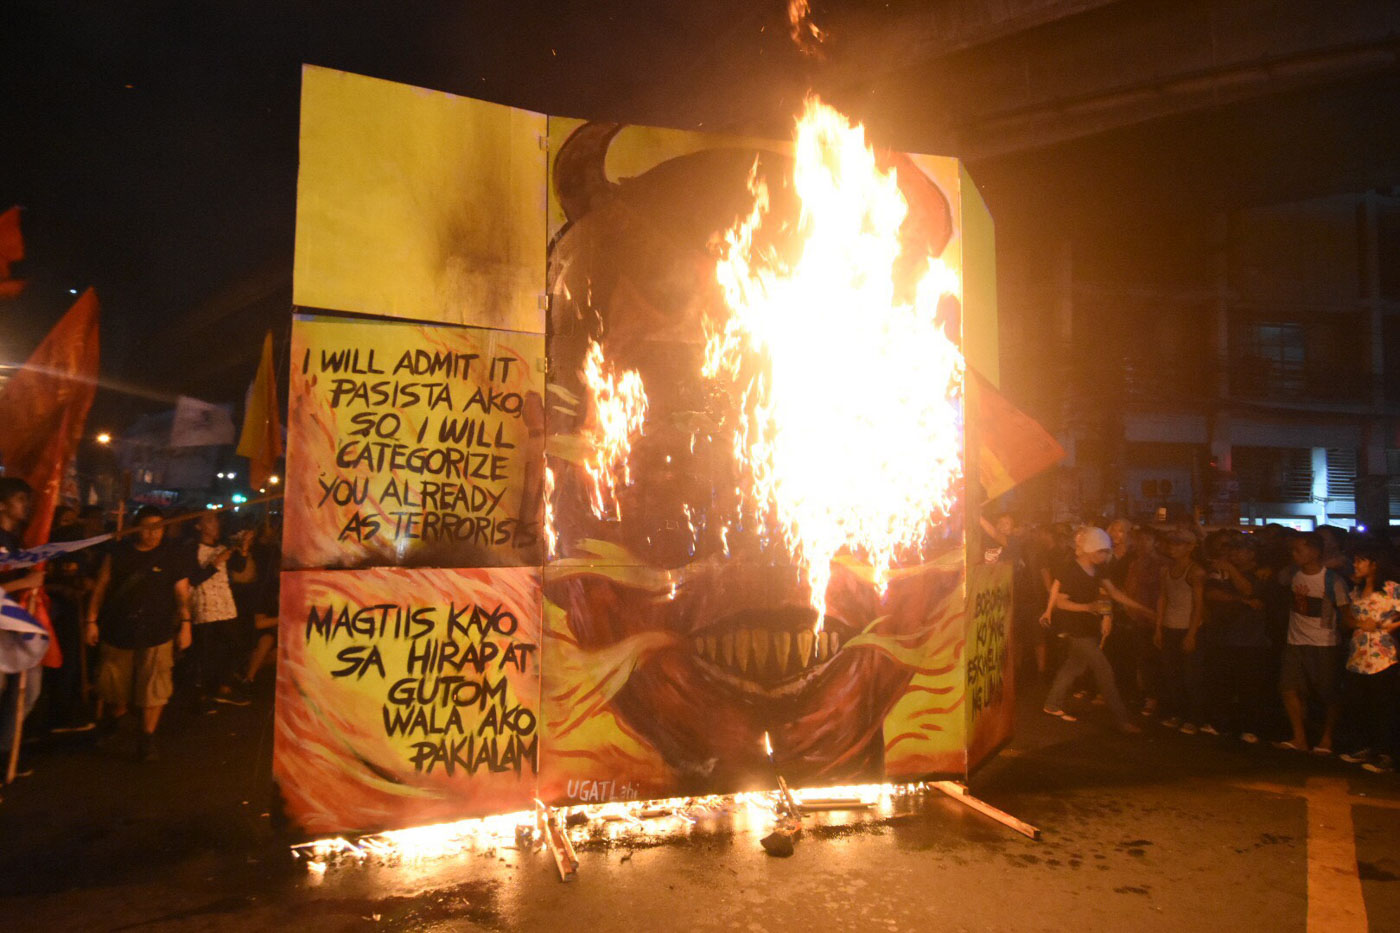 BURN. Protesters burn the effigy of President Rodrigo Duterte at Mendiola in Manila on December 10, 2017. Photo by Angie de Silva/Rappler